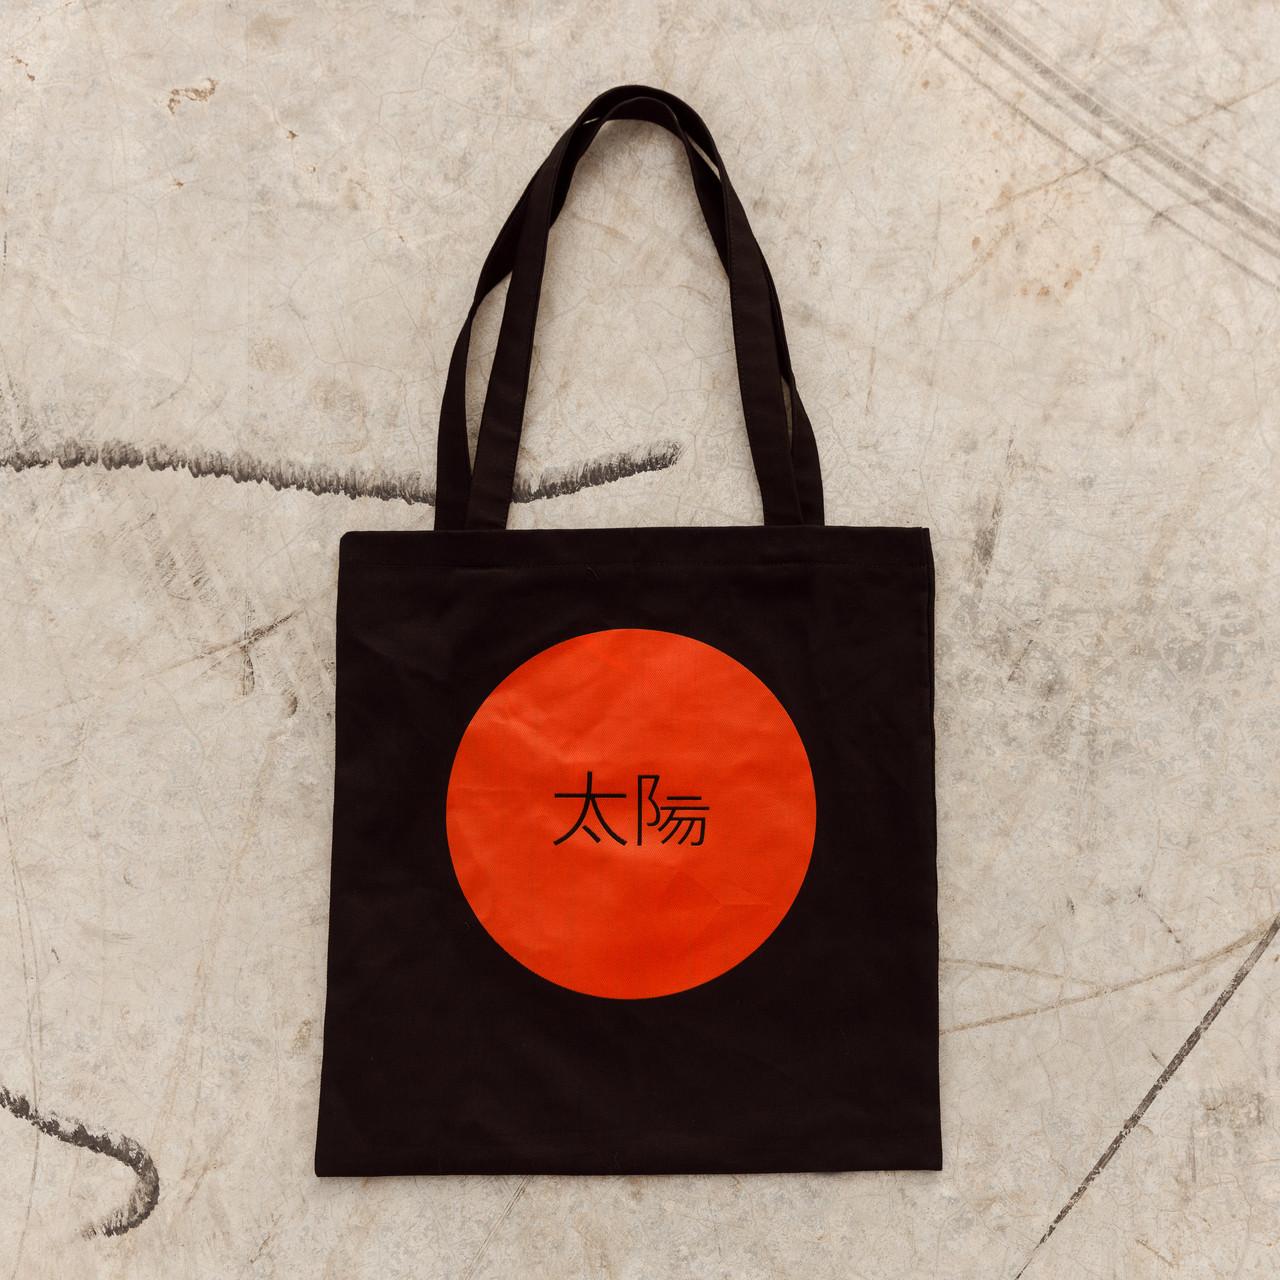 Шоппер чёрный  бренд ТУР модель Солнце Экосумка из ткани TУRWEAR